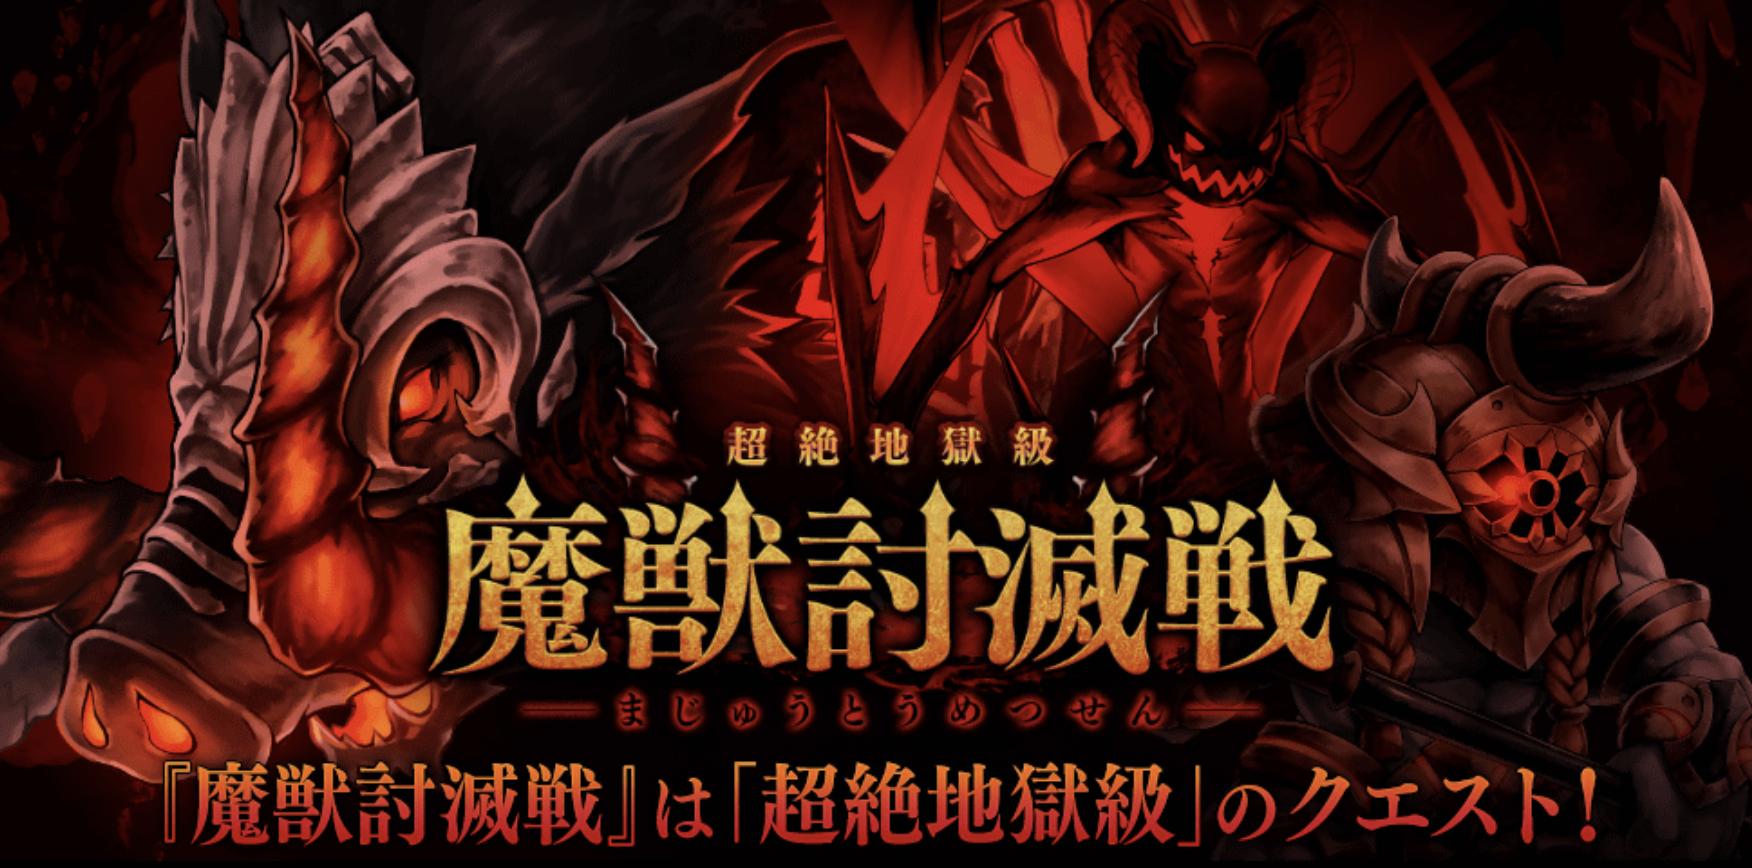 【タガタメ】魔獣討滅戦攻略者攻略【超絶地獄級】